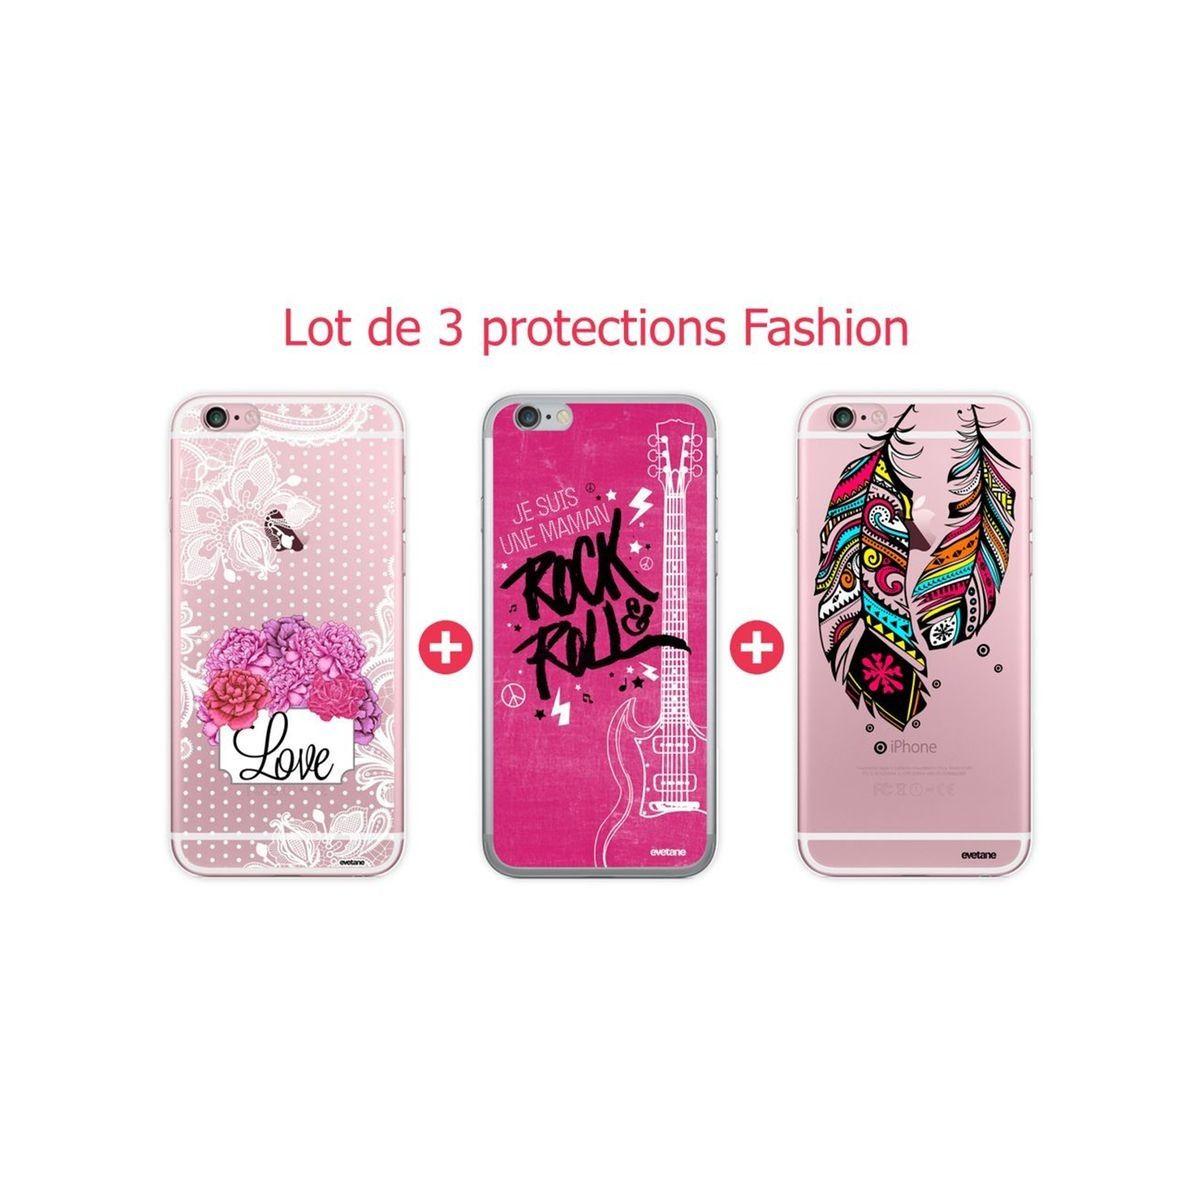 coque iphone 6 lot de 3